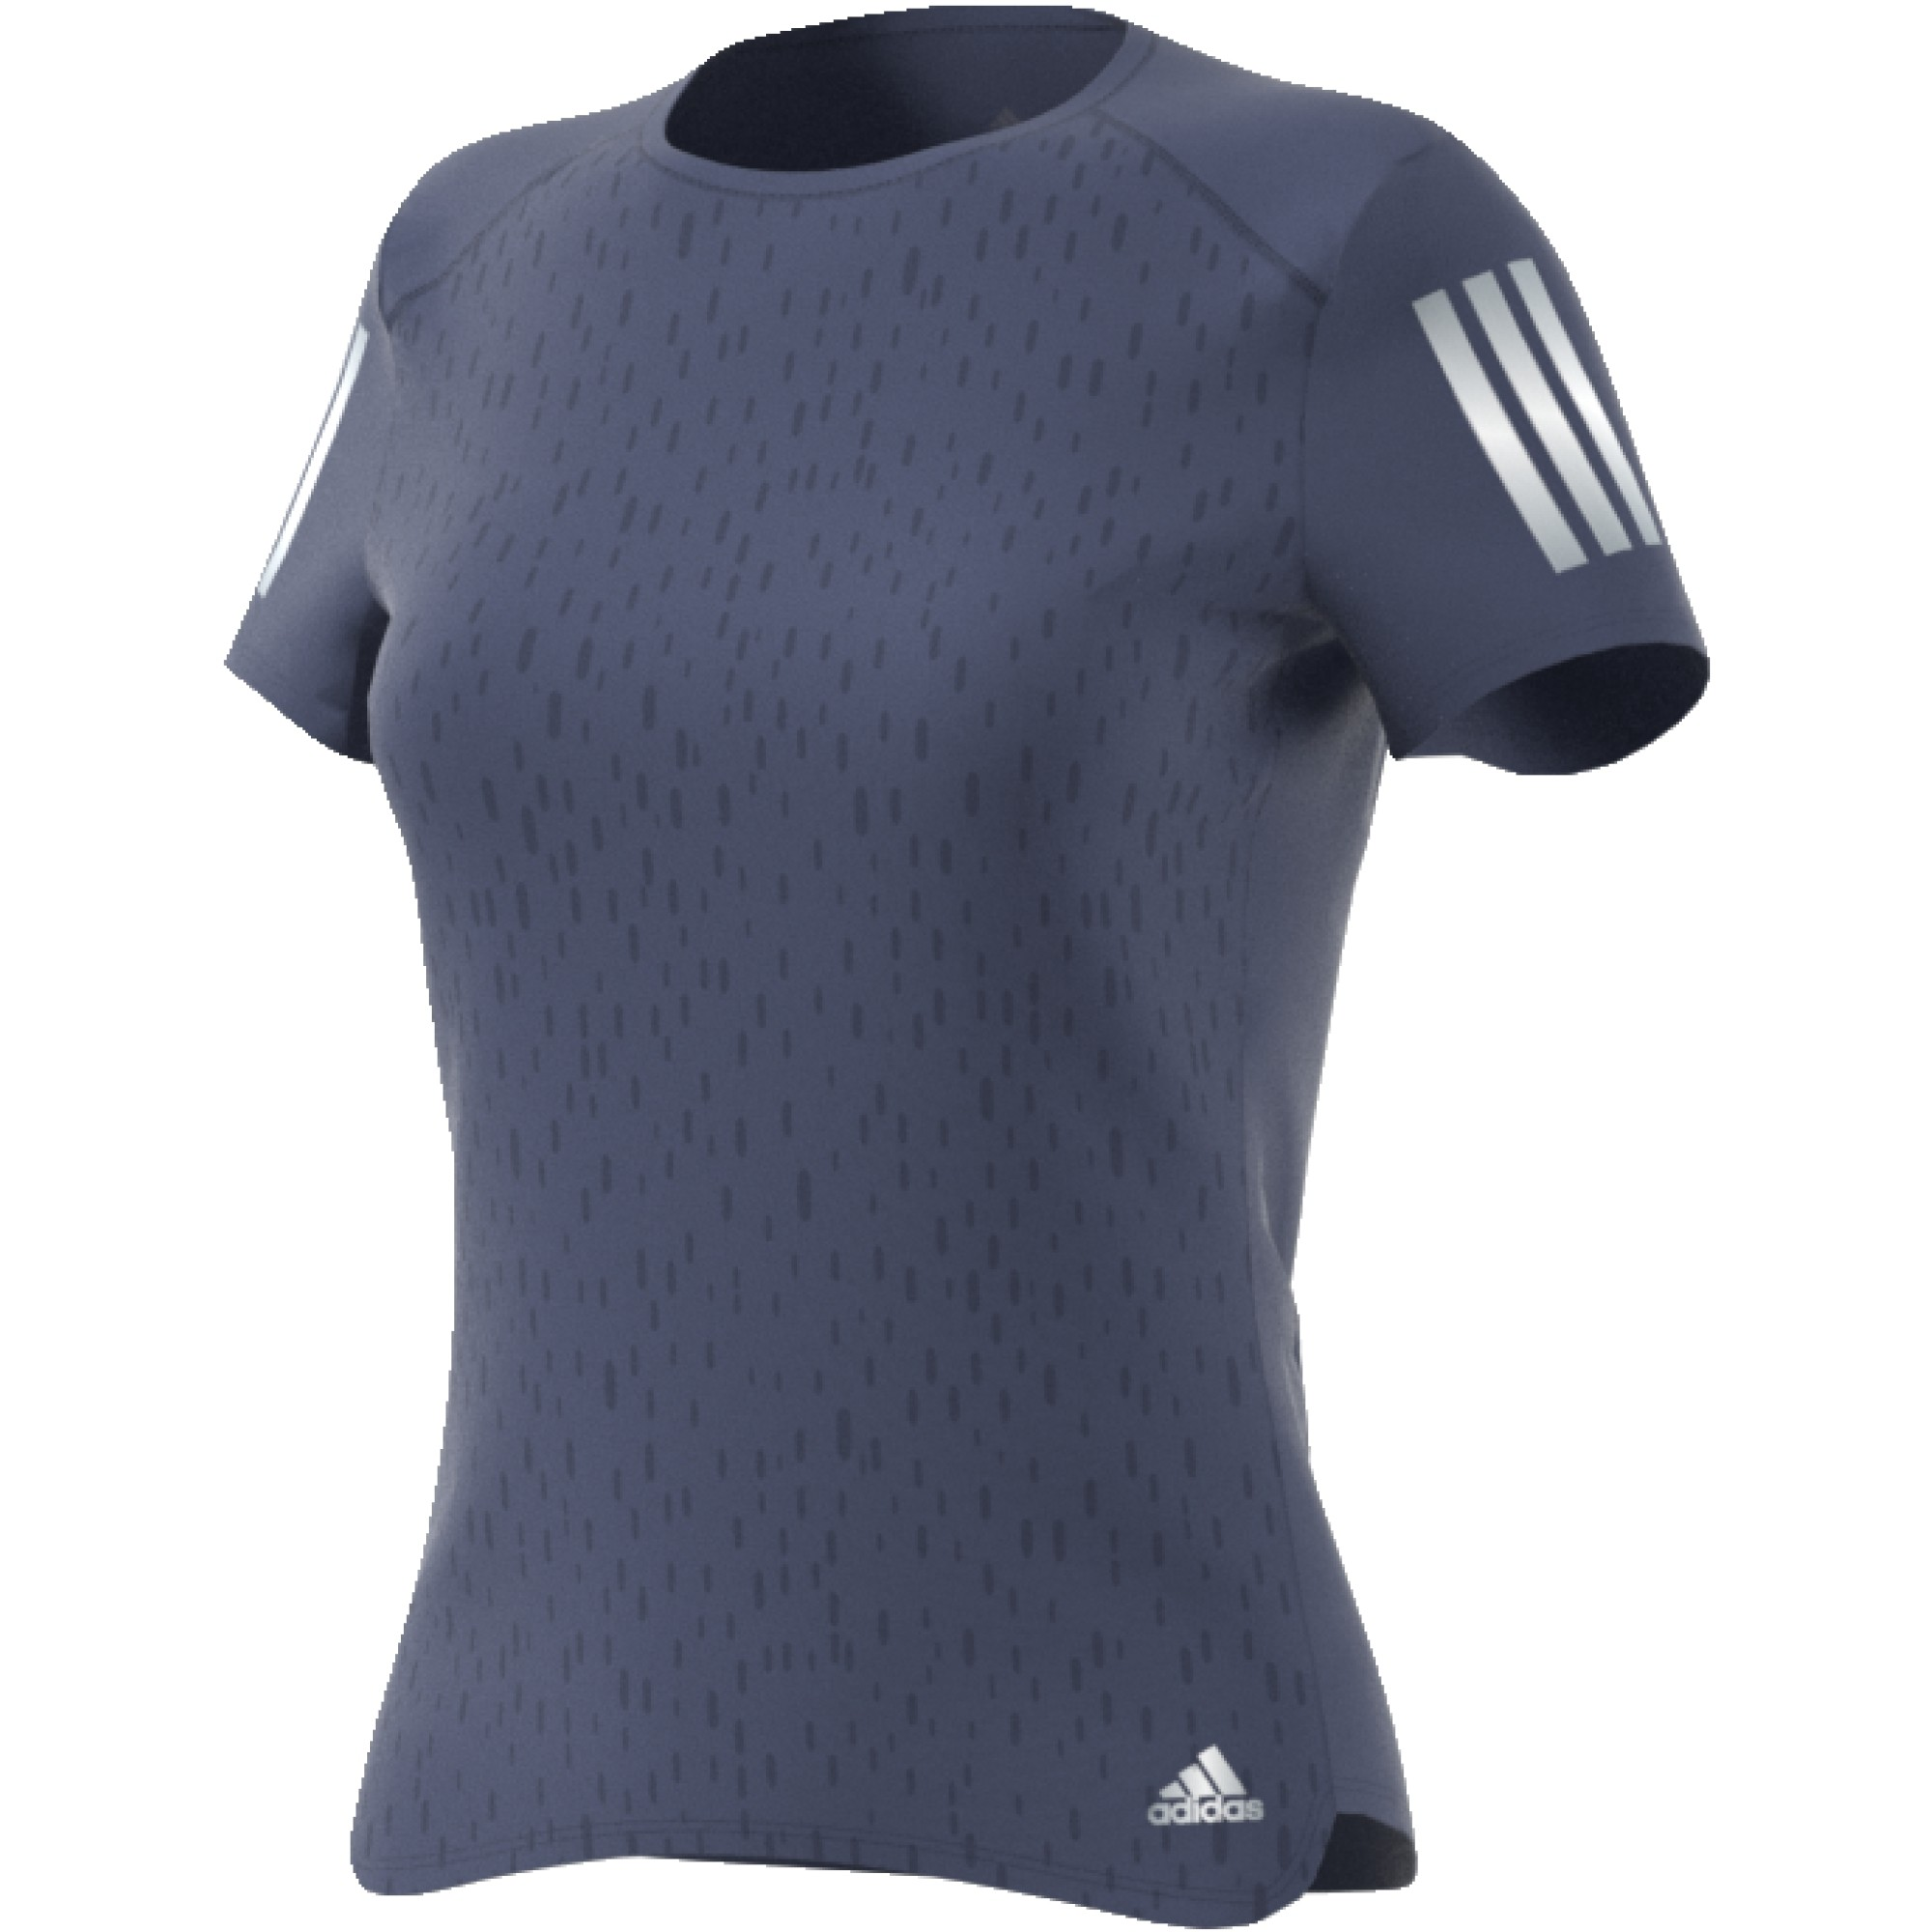 e985743a1368b adidas-response-short-sleeve-tee-laufshirts-damen -blau-pid-000000000010137771.jpg